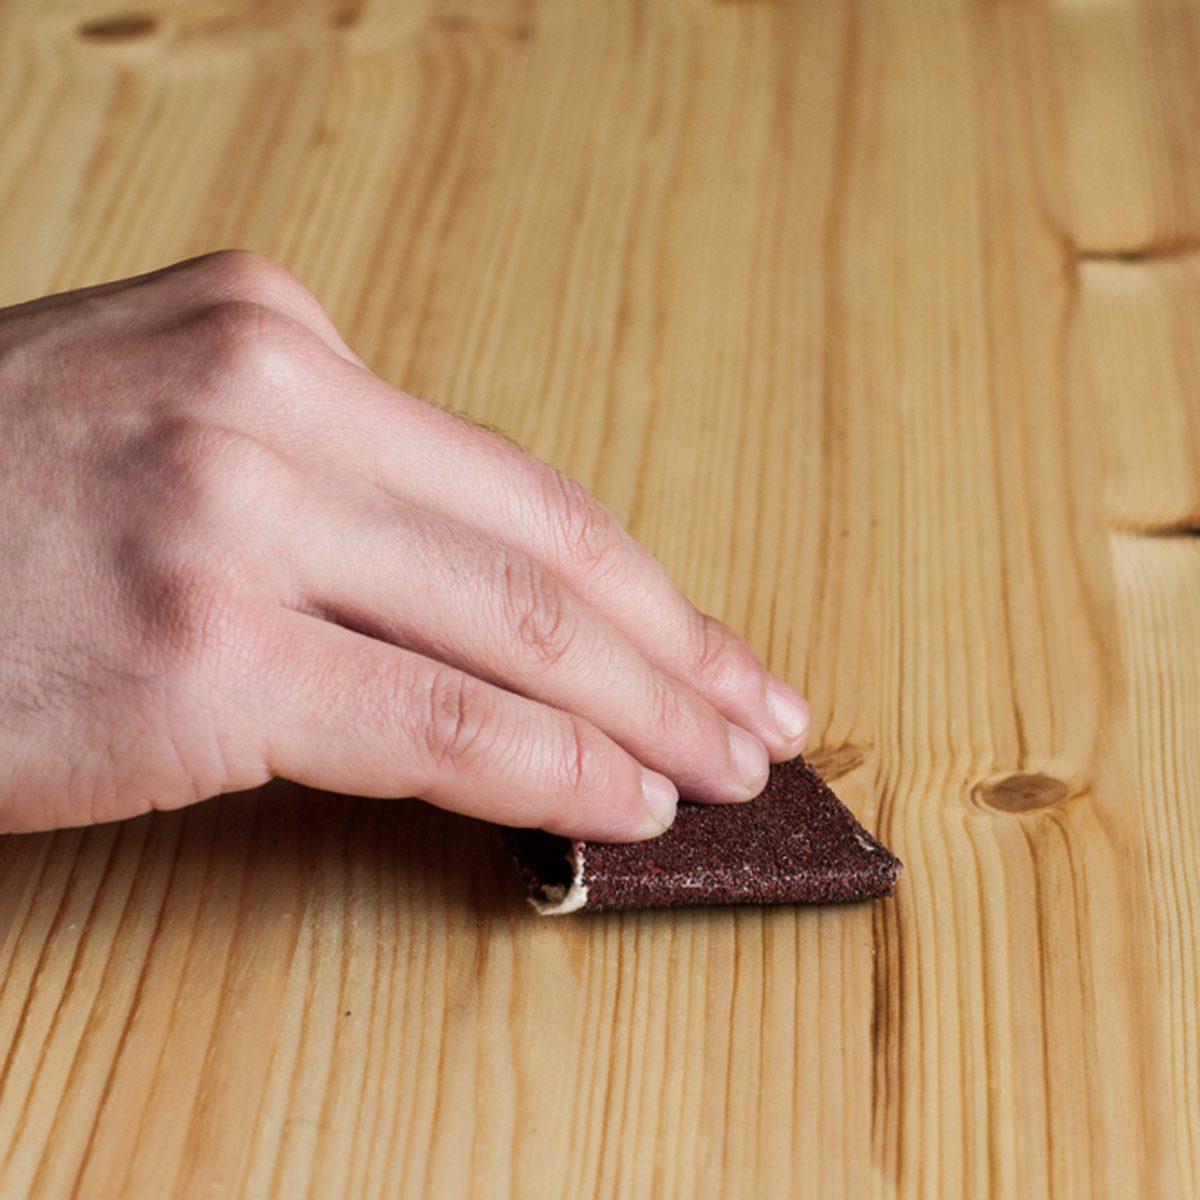 10 Secrets of Amish Furniture Makers | Family Handyman